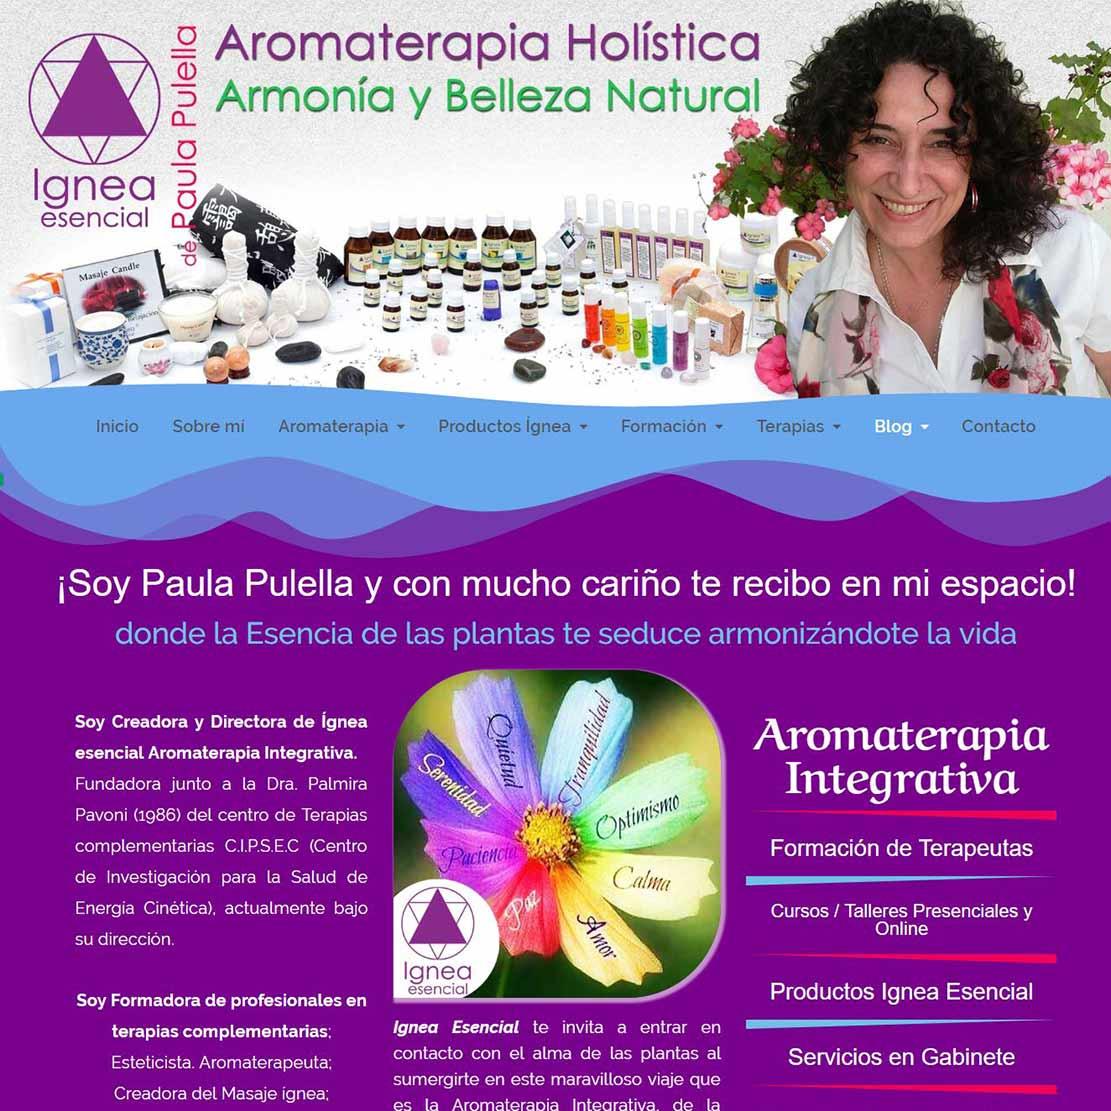 Ignea Esencial Aromaterapia Integrativa